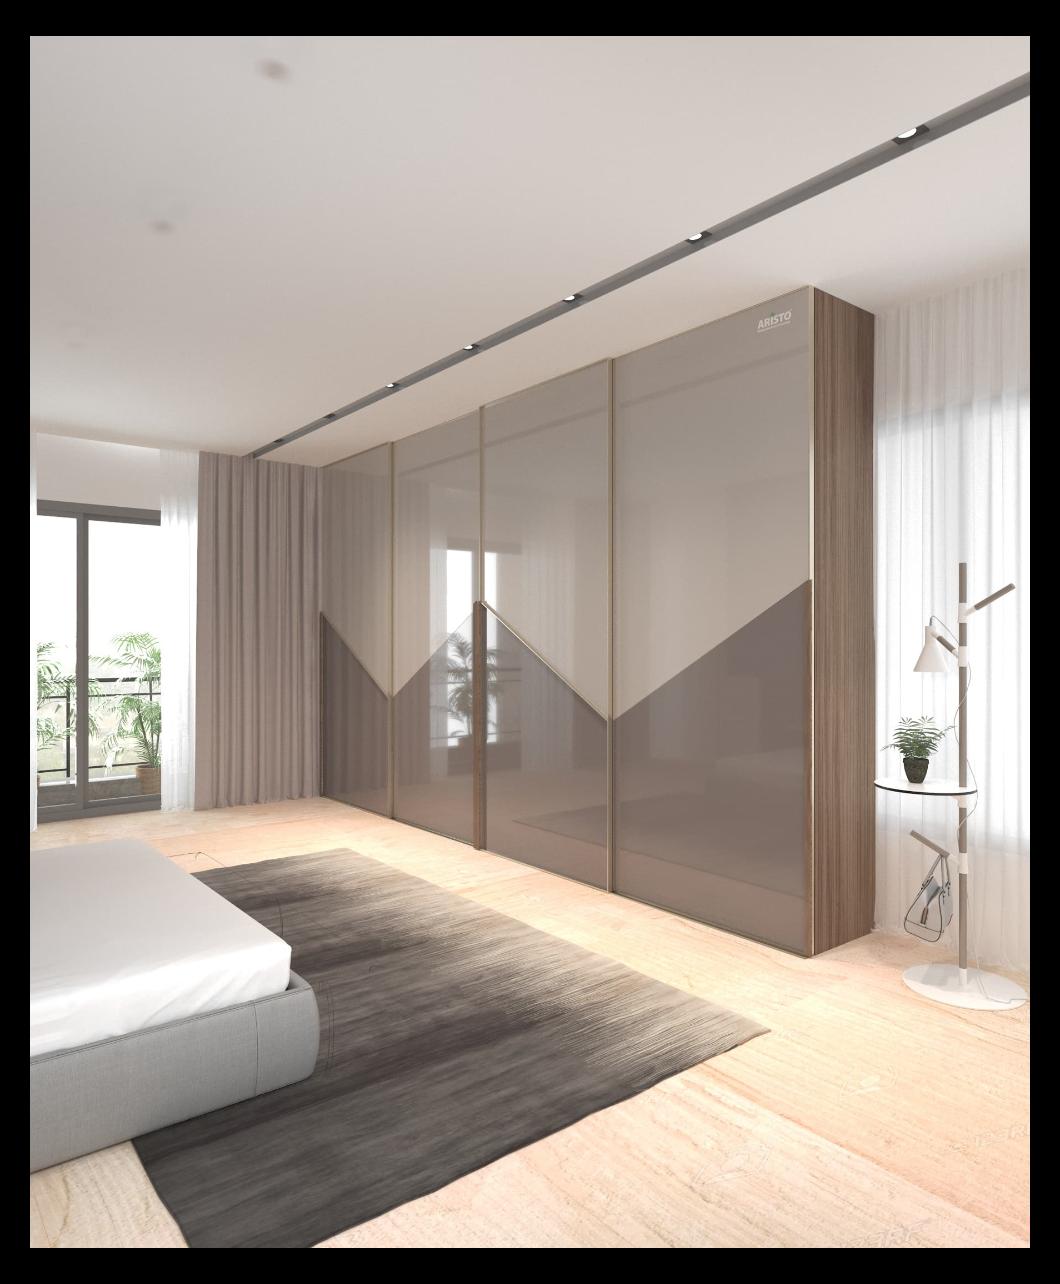 Aristo Collections Mosaic Wardrobe Design Bedroom Sliding Modern In 2021 Wardrobe Design Bedroom Master Bedroom Wardrobe Designs Sliding Door Wardrobe Designs